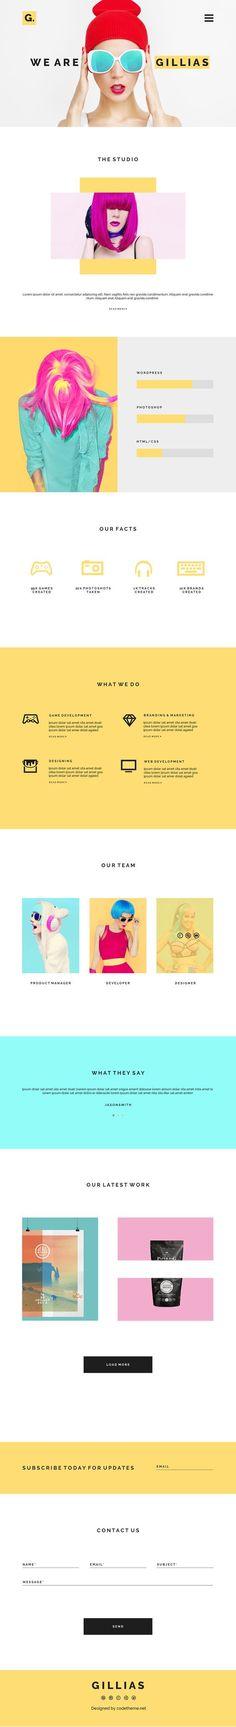 Gillias Agency Web Design by Daniel Pervaiz